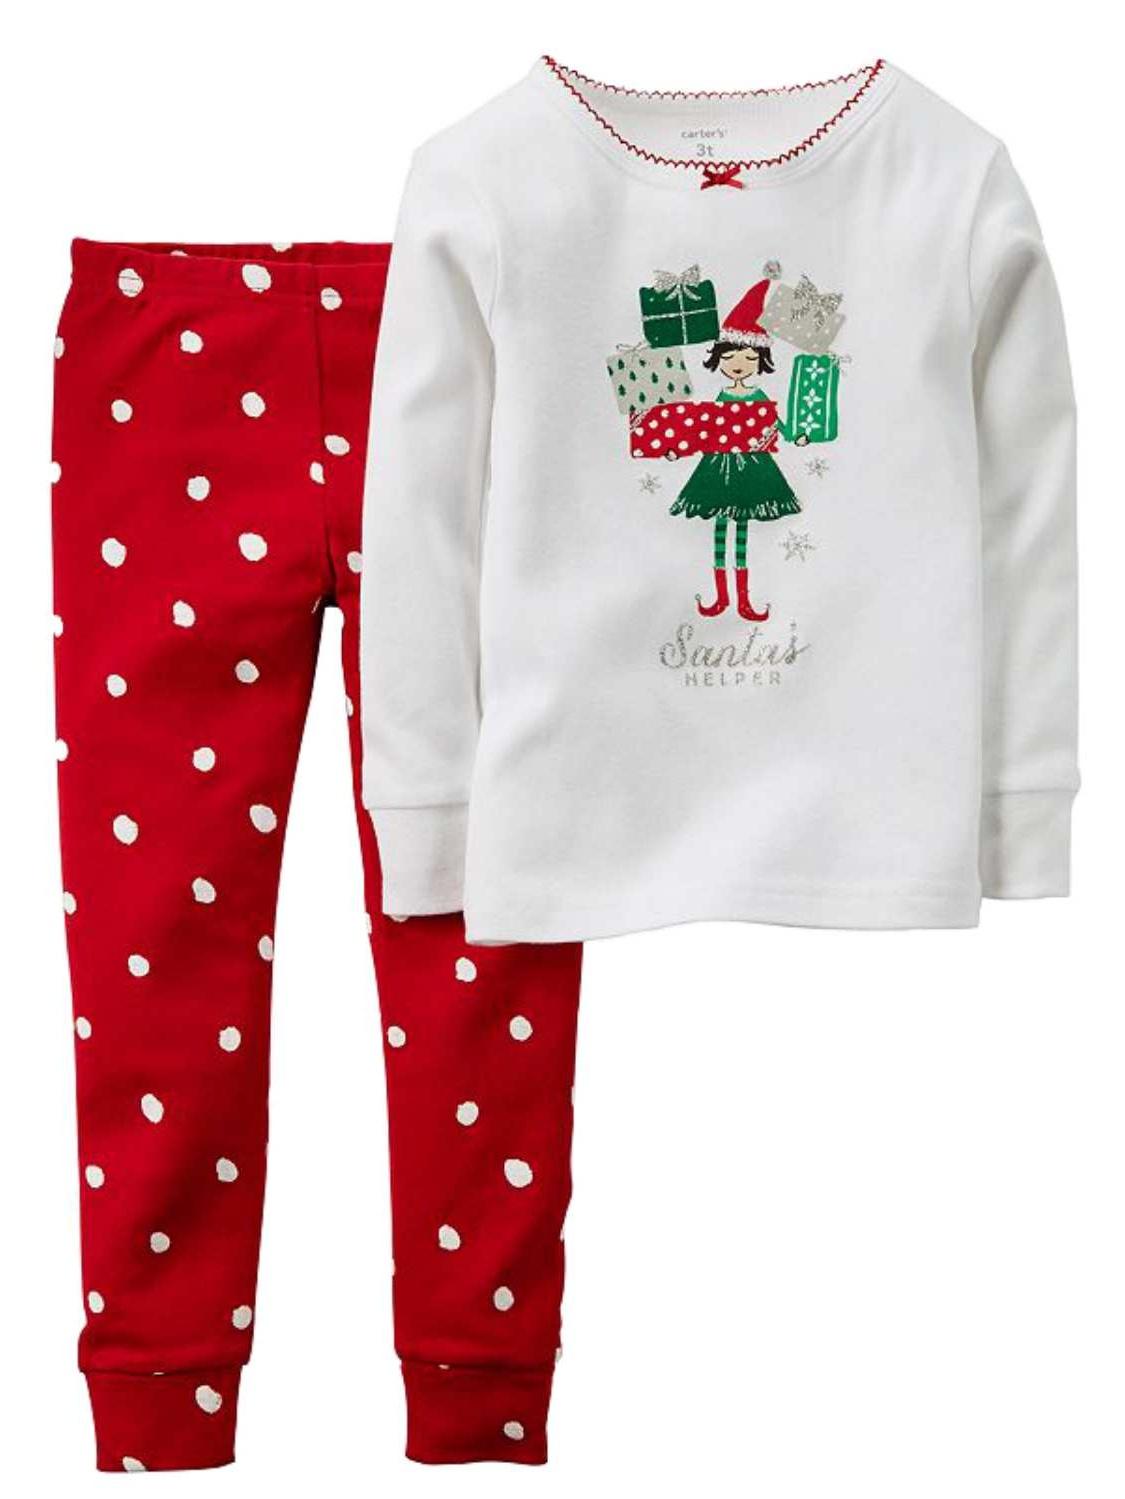 Carters Infant Toddler Girls Santas Helper Elf Holiday Pajama 2 PC Sleep Set